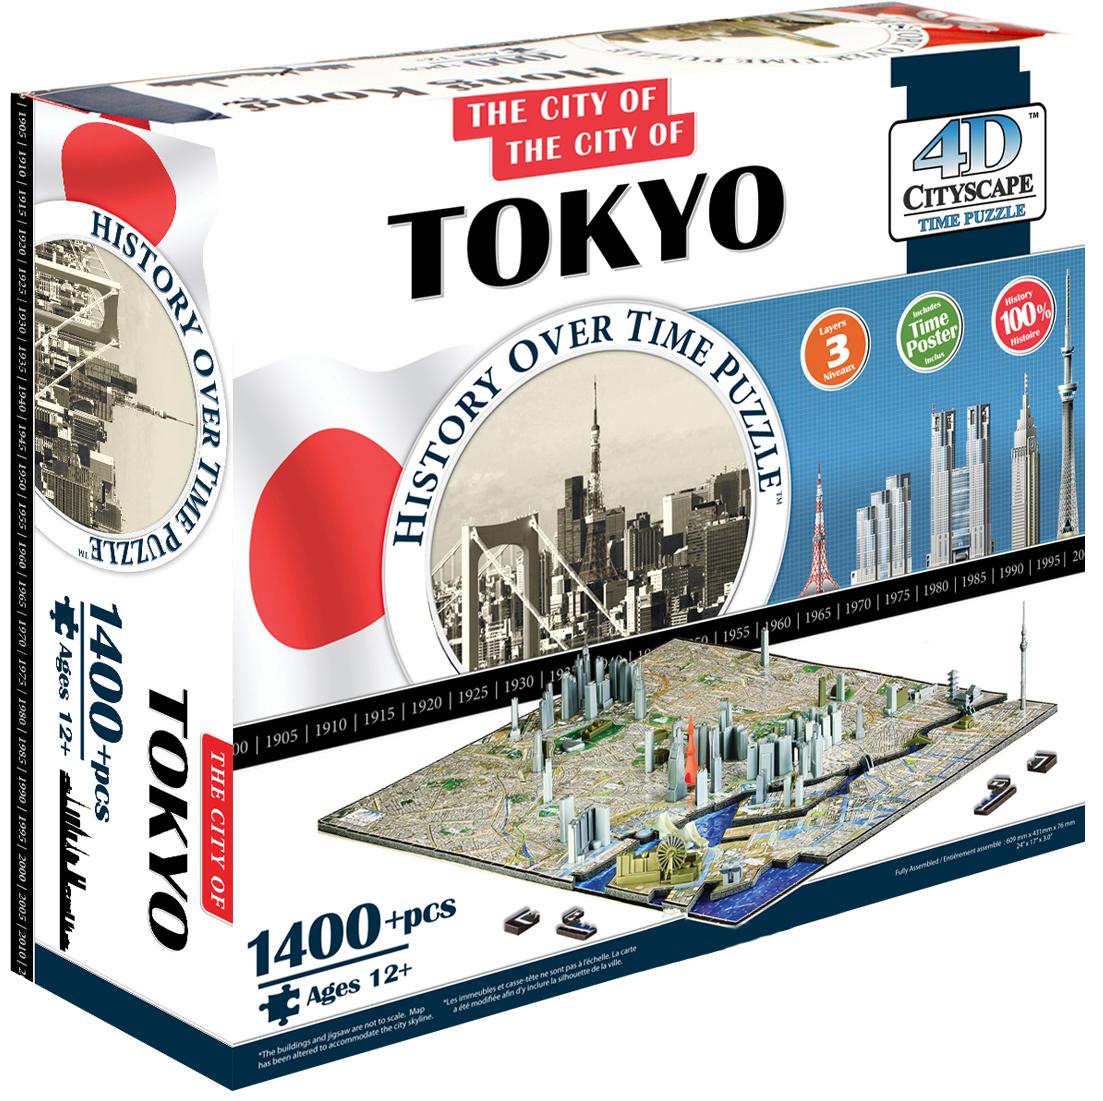 Пазлы 4D Cityscape Пазл 4D Cityscape «Токио» 1400 дет. объемный фен ga ma legerro ozone ion 4d a21 leggeroion 4d